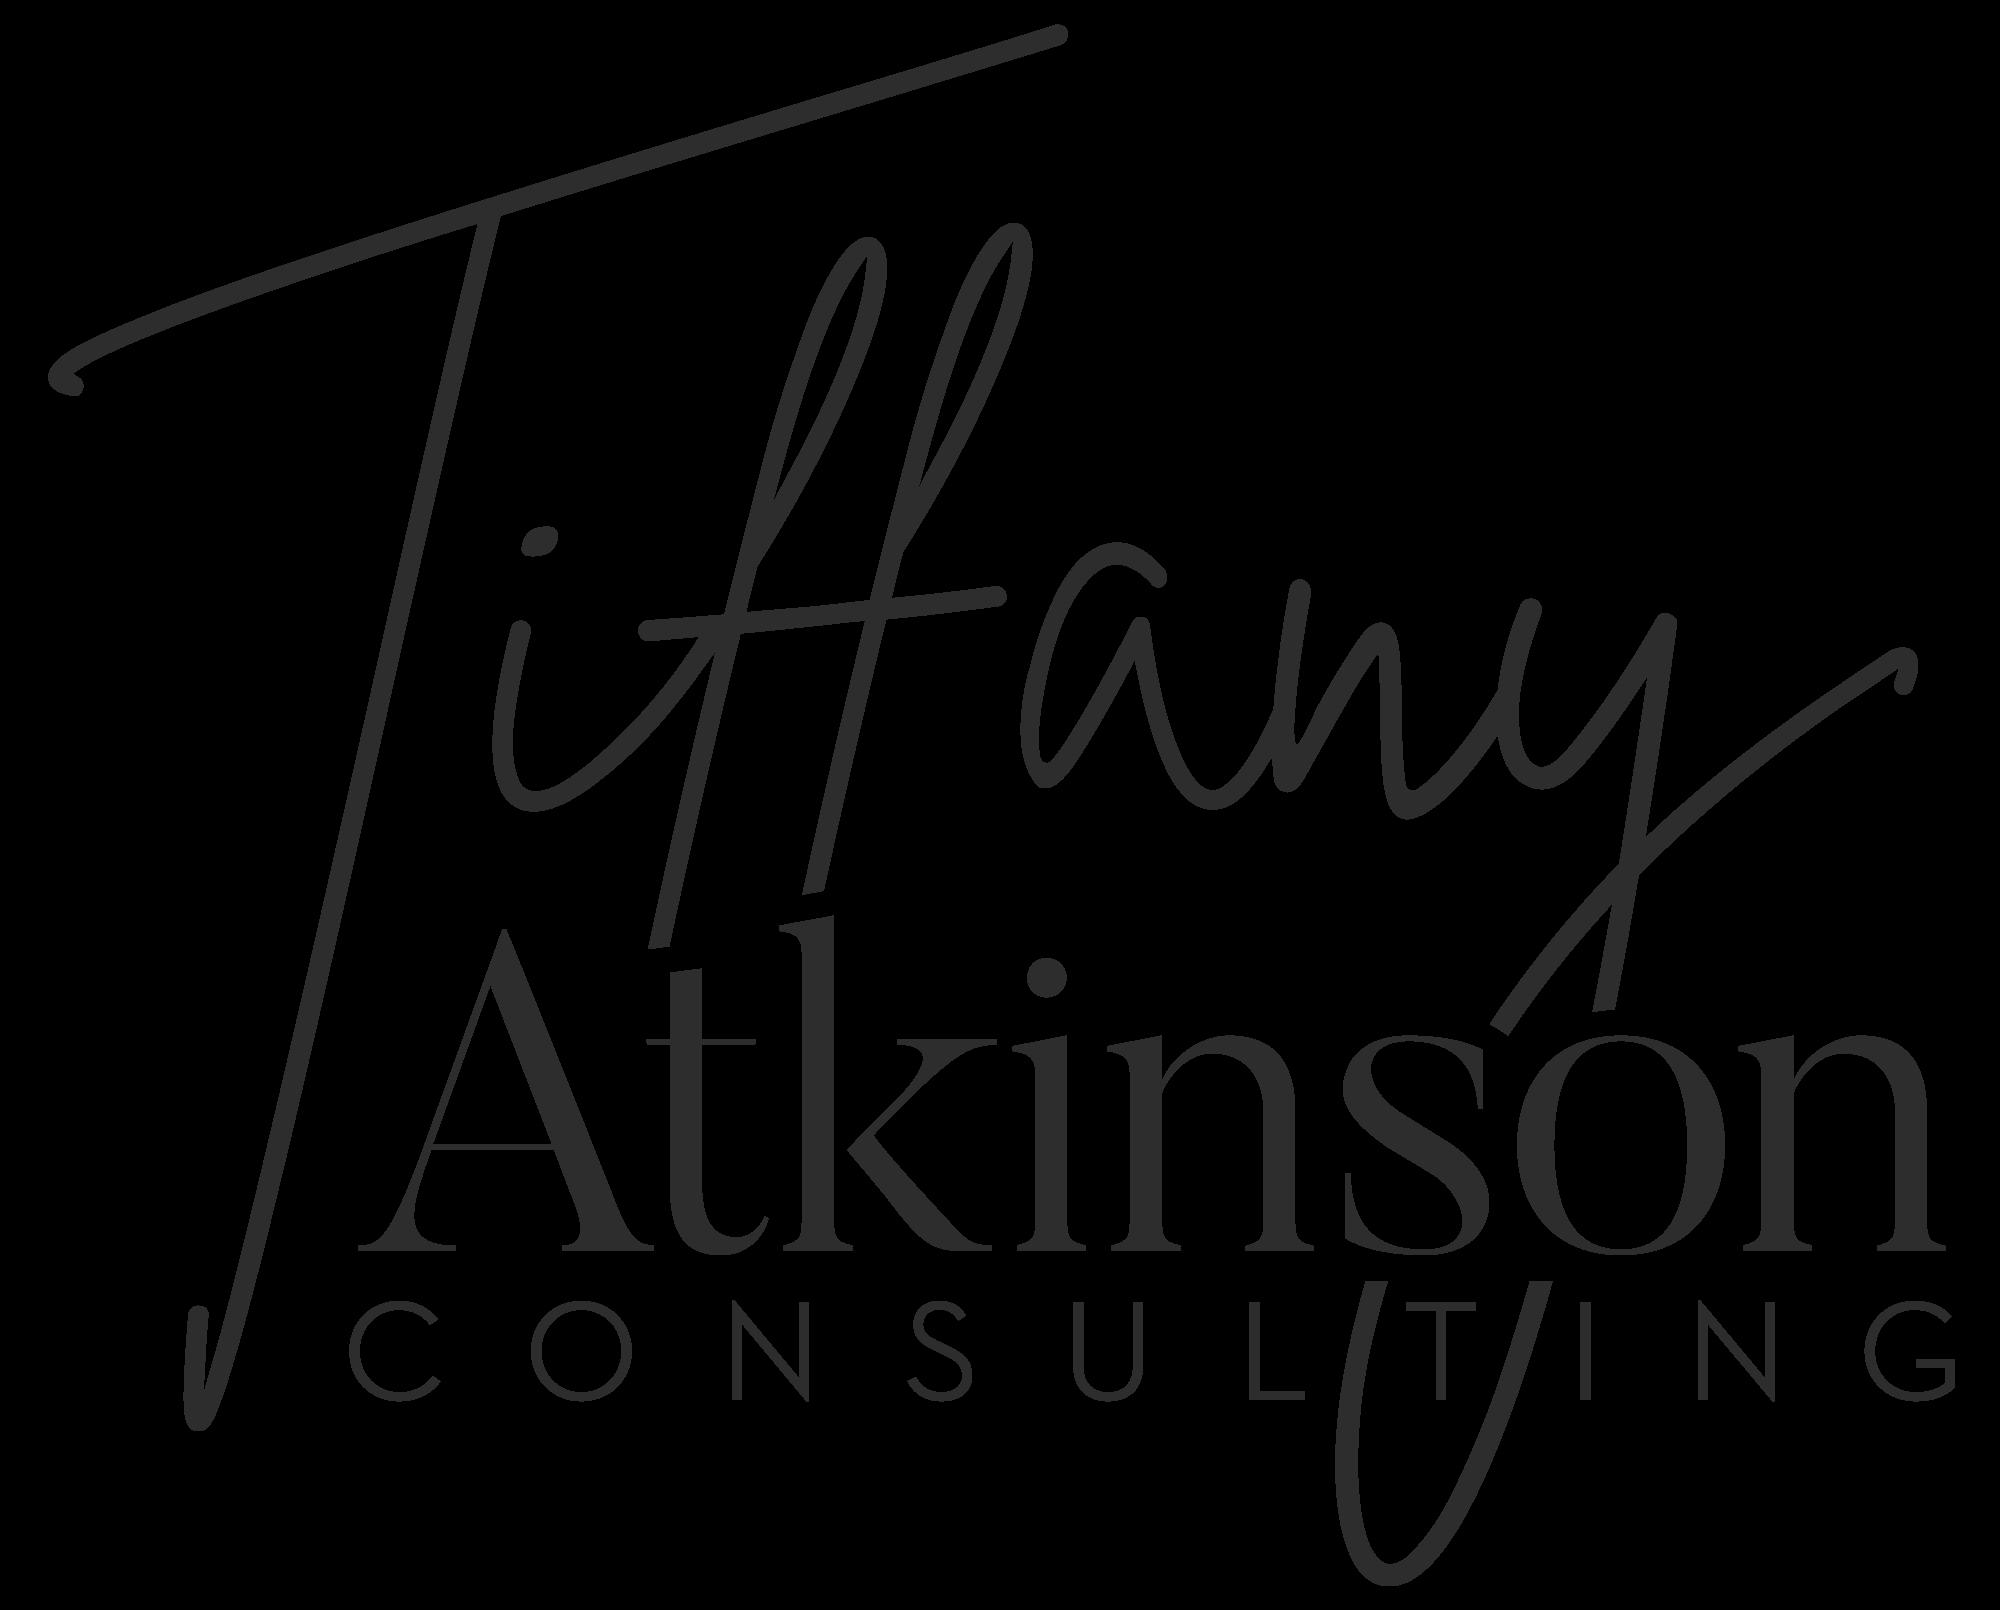 Tiffany Atkinson Consulting Logo | Brand Coach & Consultant For Women | tiffanyatkinson.com